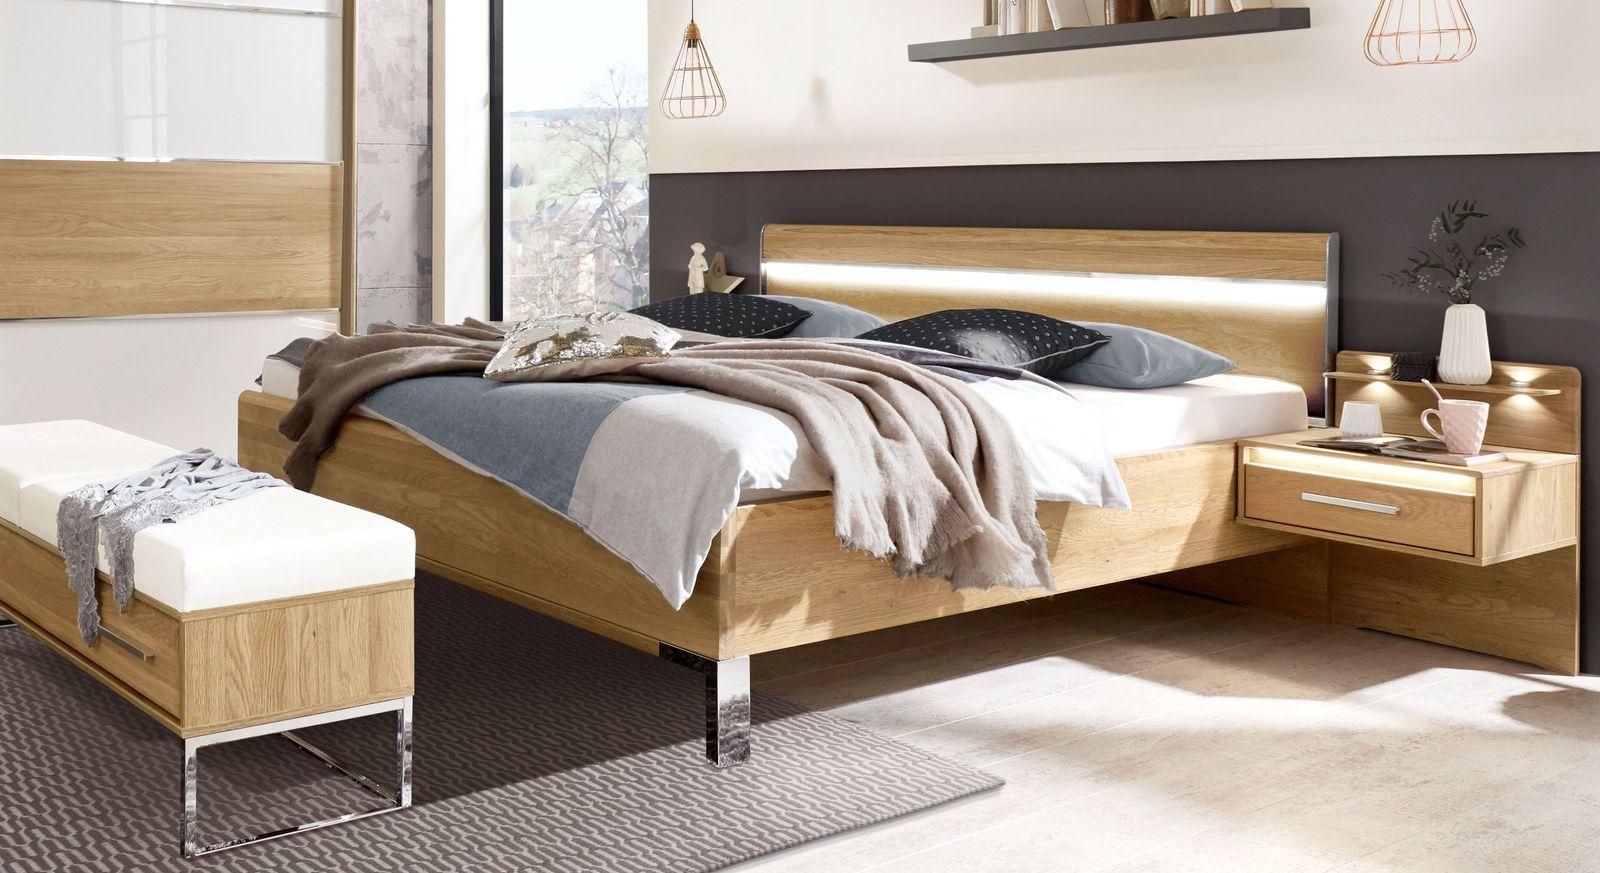 Bett Chipperfield mit komfortabler Bettrahmenhöhe